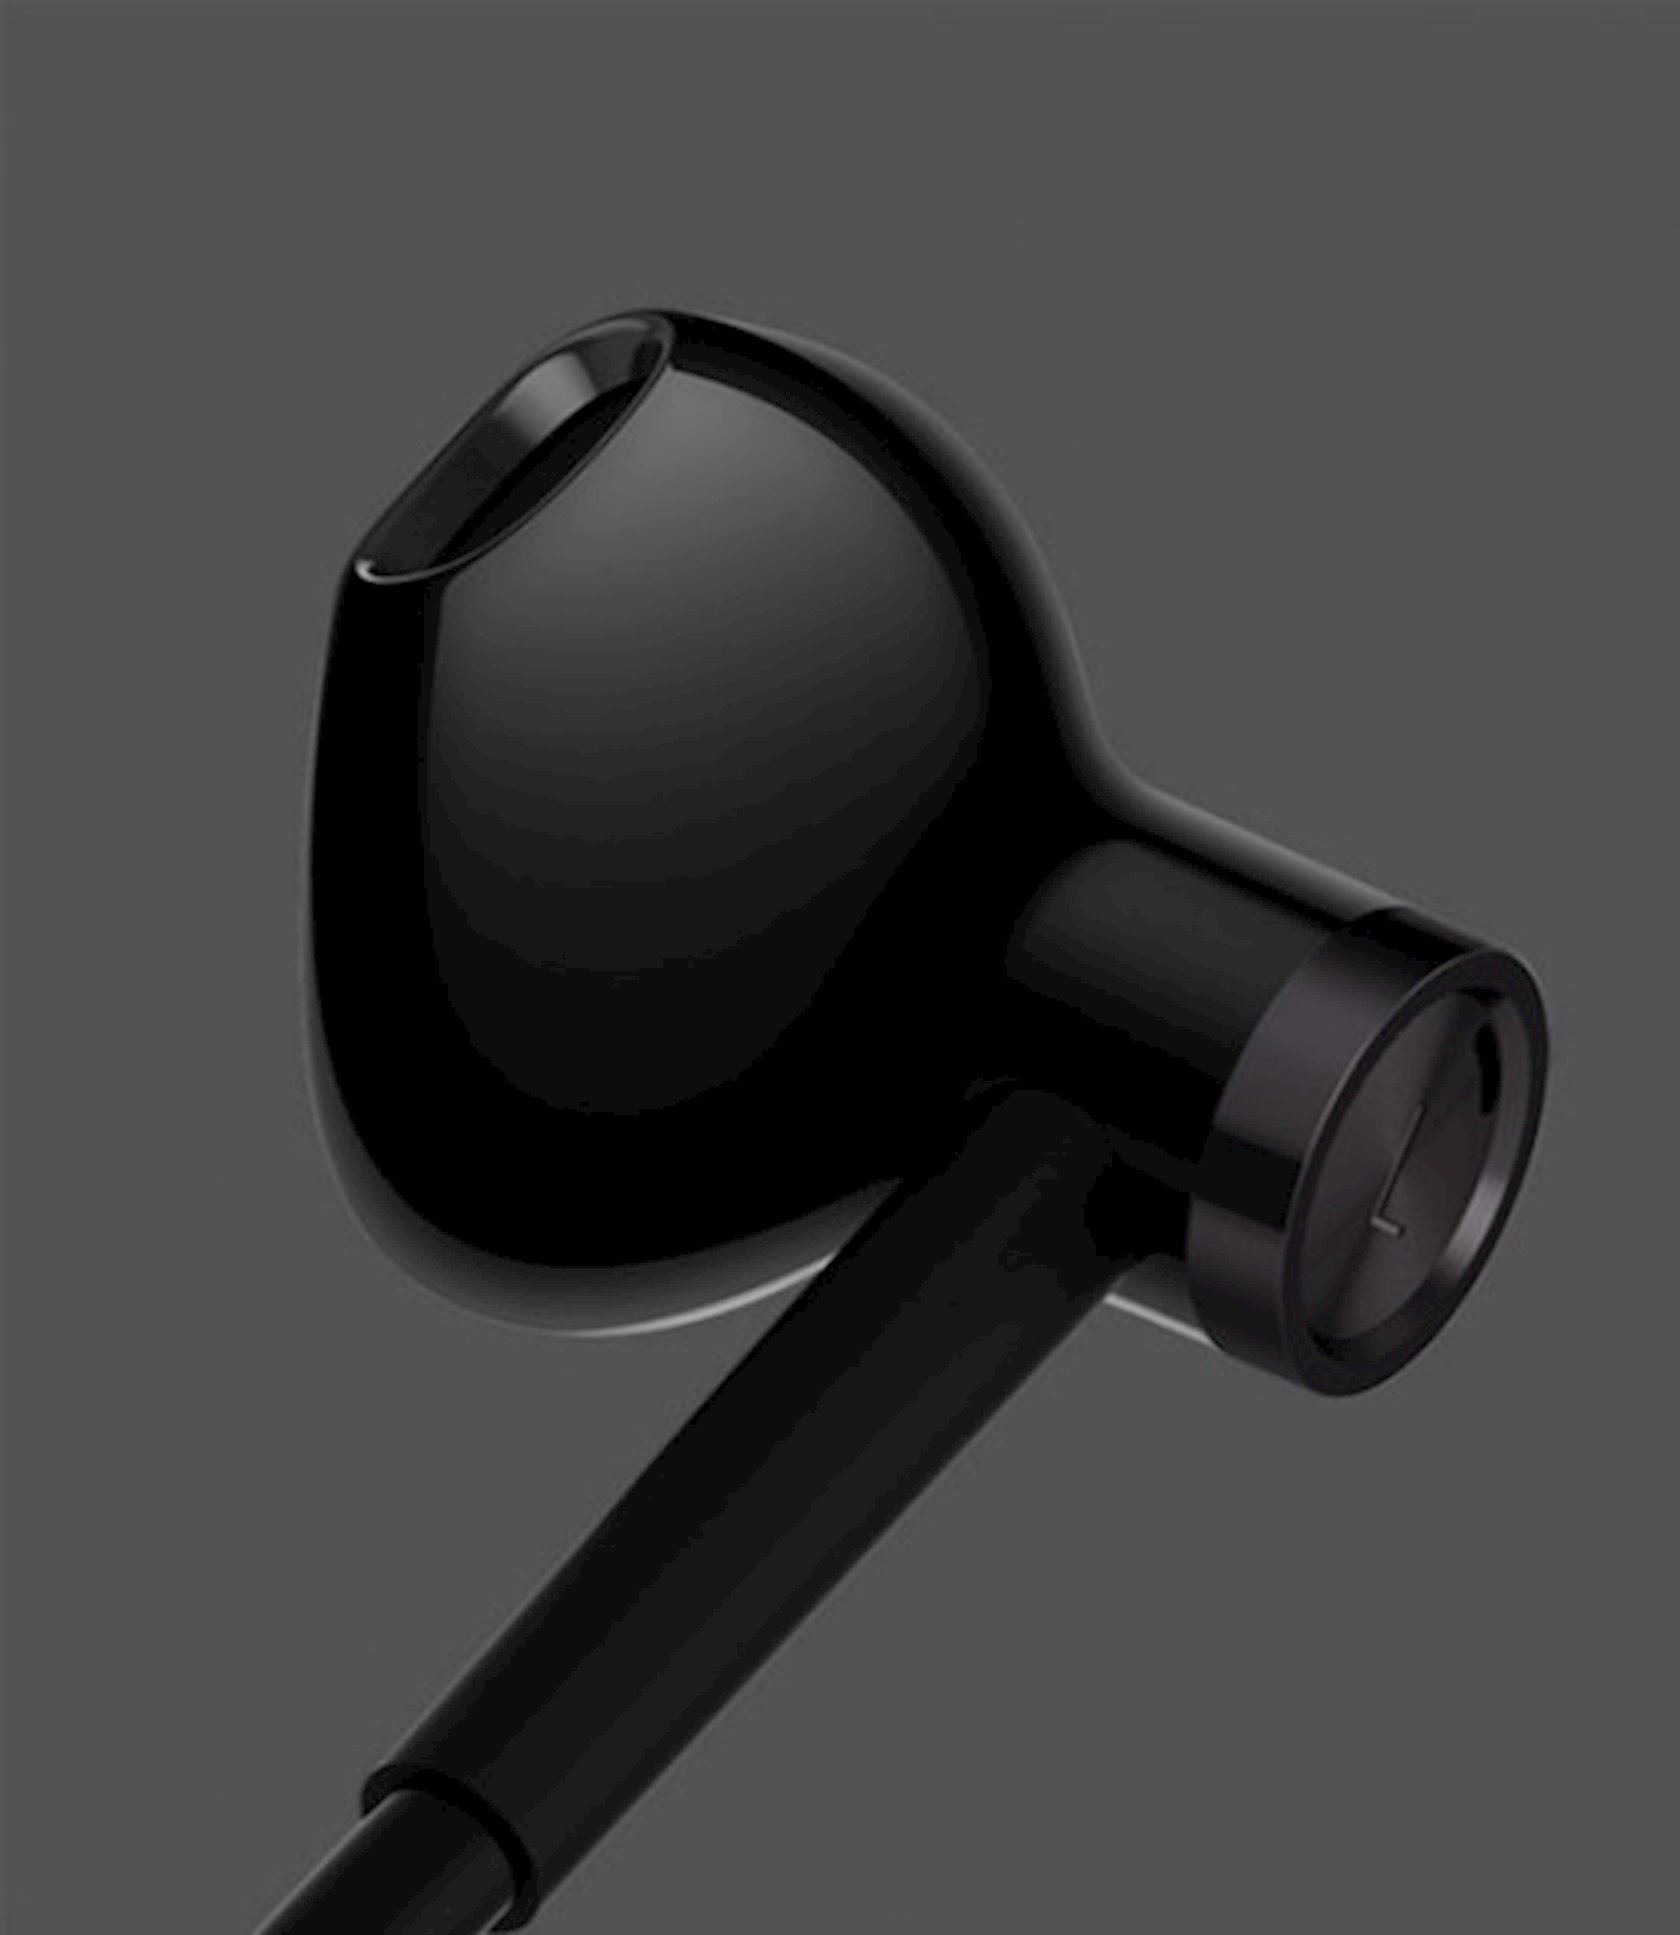 Simli qulaqlıqlar Xiaomi Dual Driver Earphones (Type-C) ZBW4435TY Black